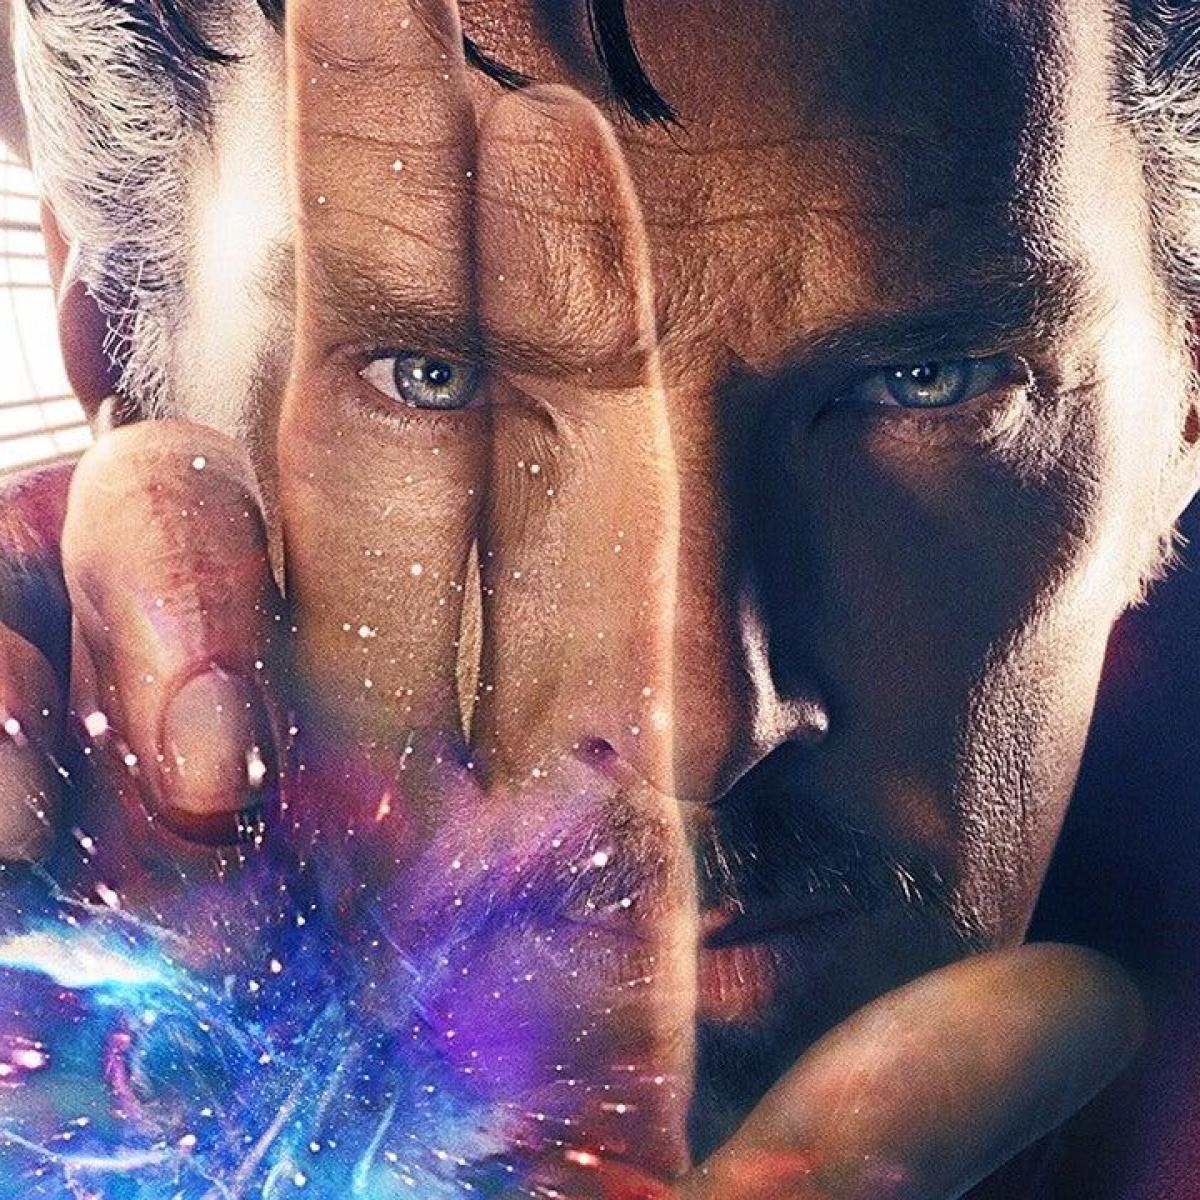 Marvel's 'Doctor Strange' sequel to have new director